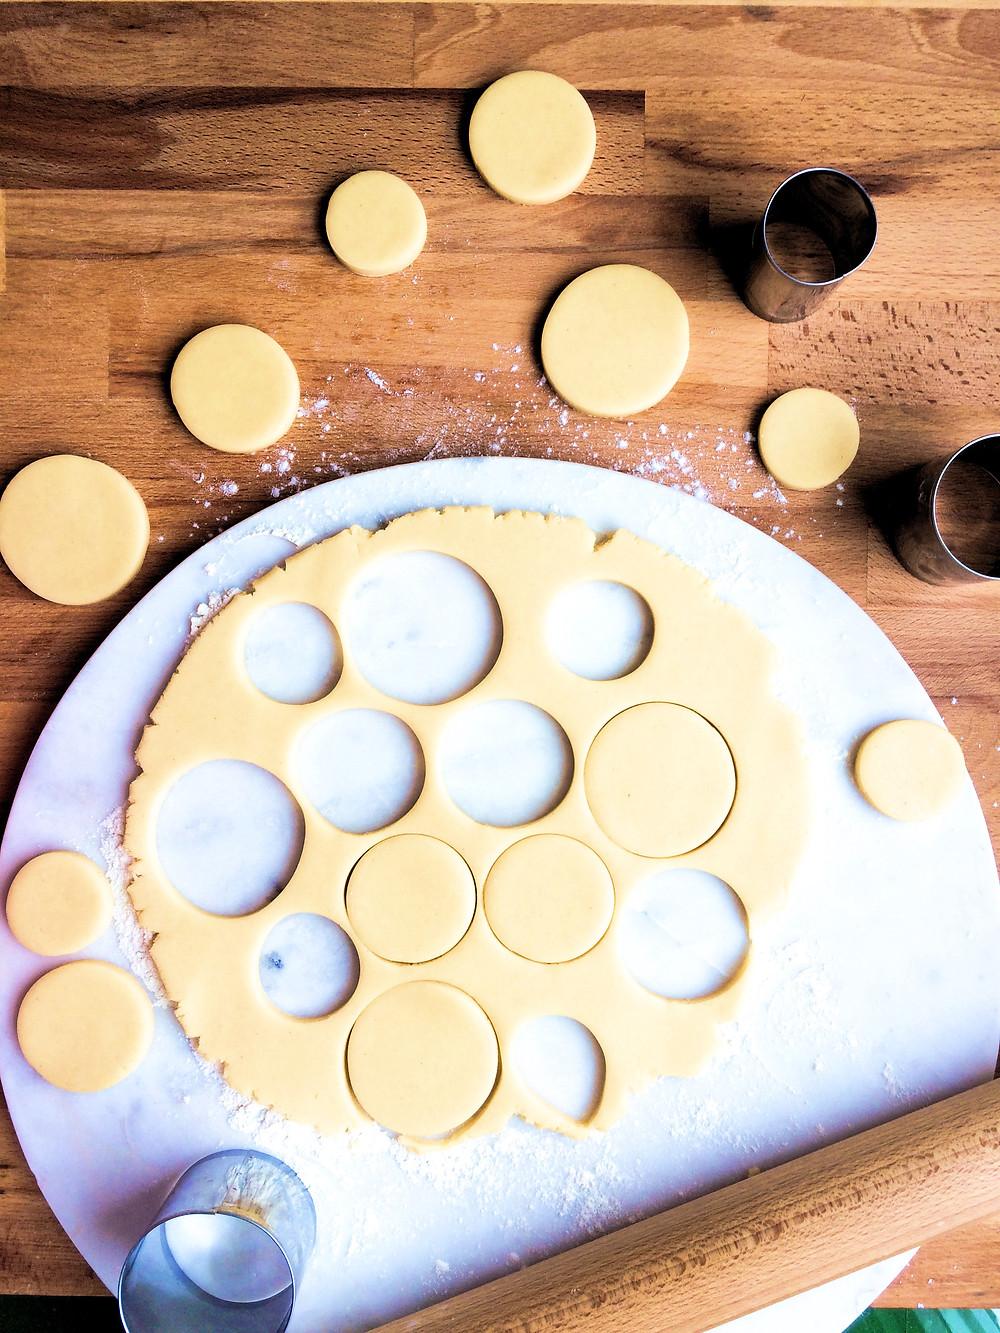 Biscuits - Sky Meadow Bakery blog